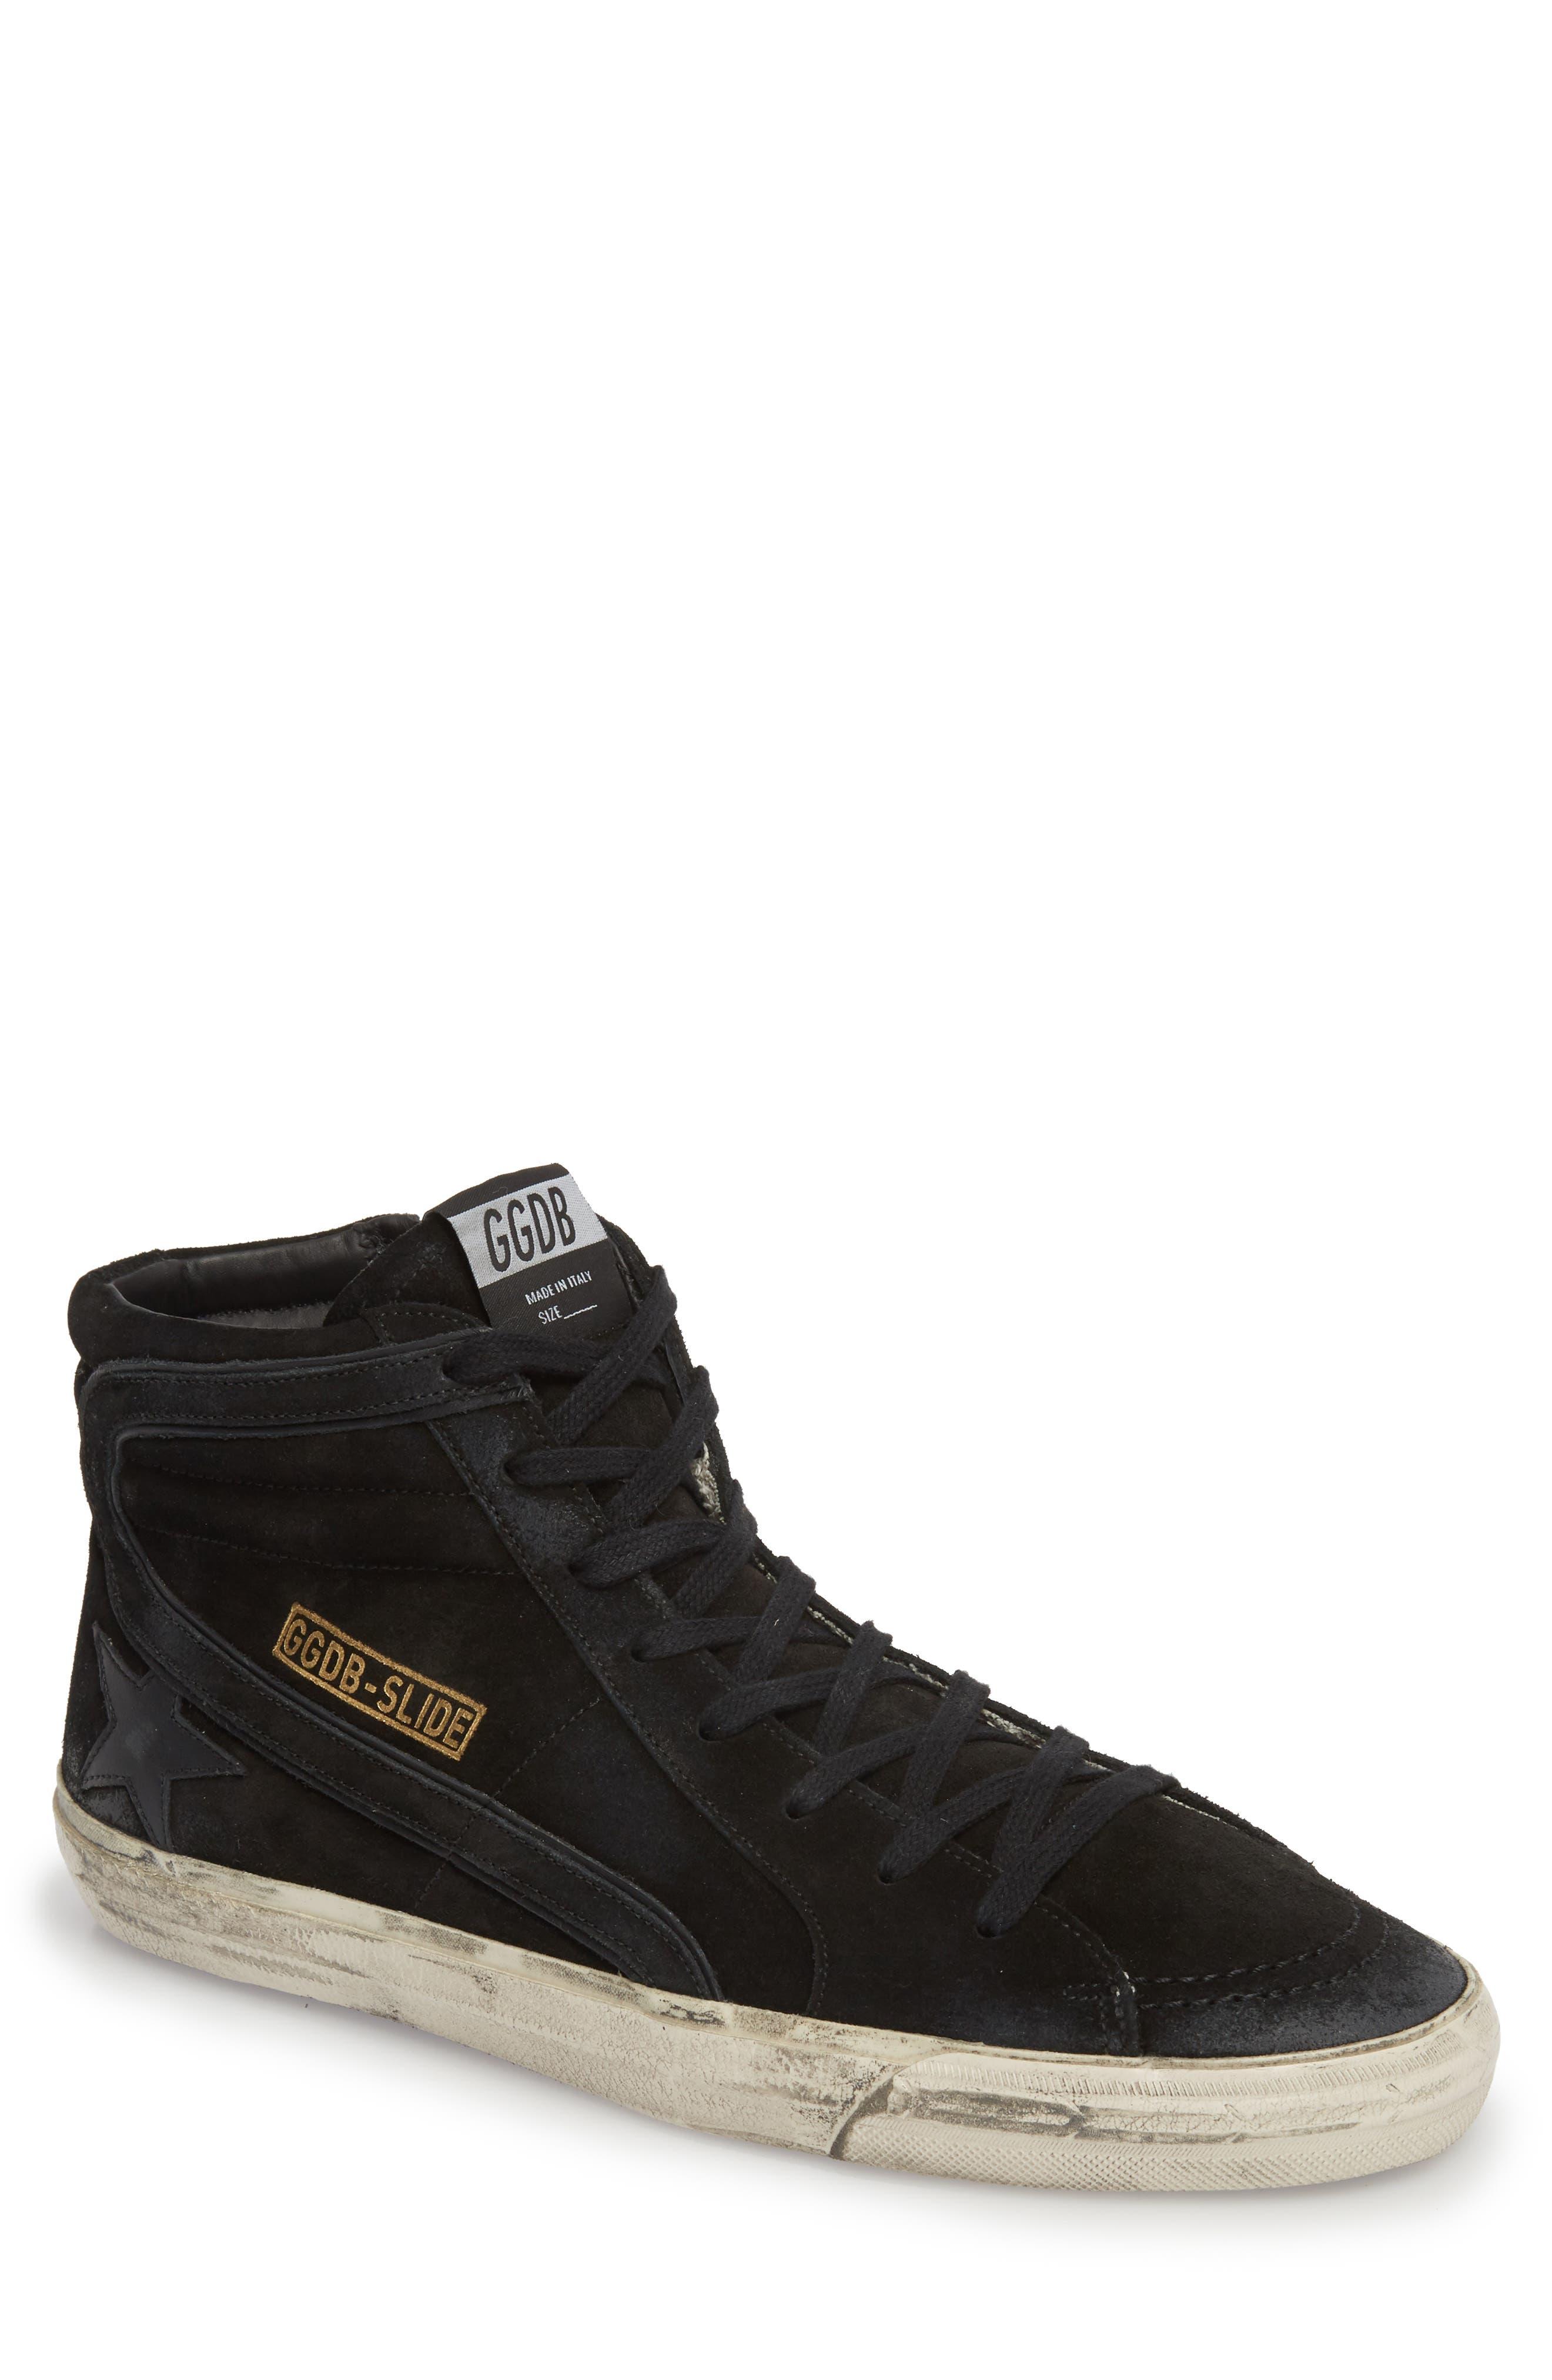 'Slide' Sneaker,                         Main,                         color, BLACK SUEDE